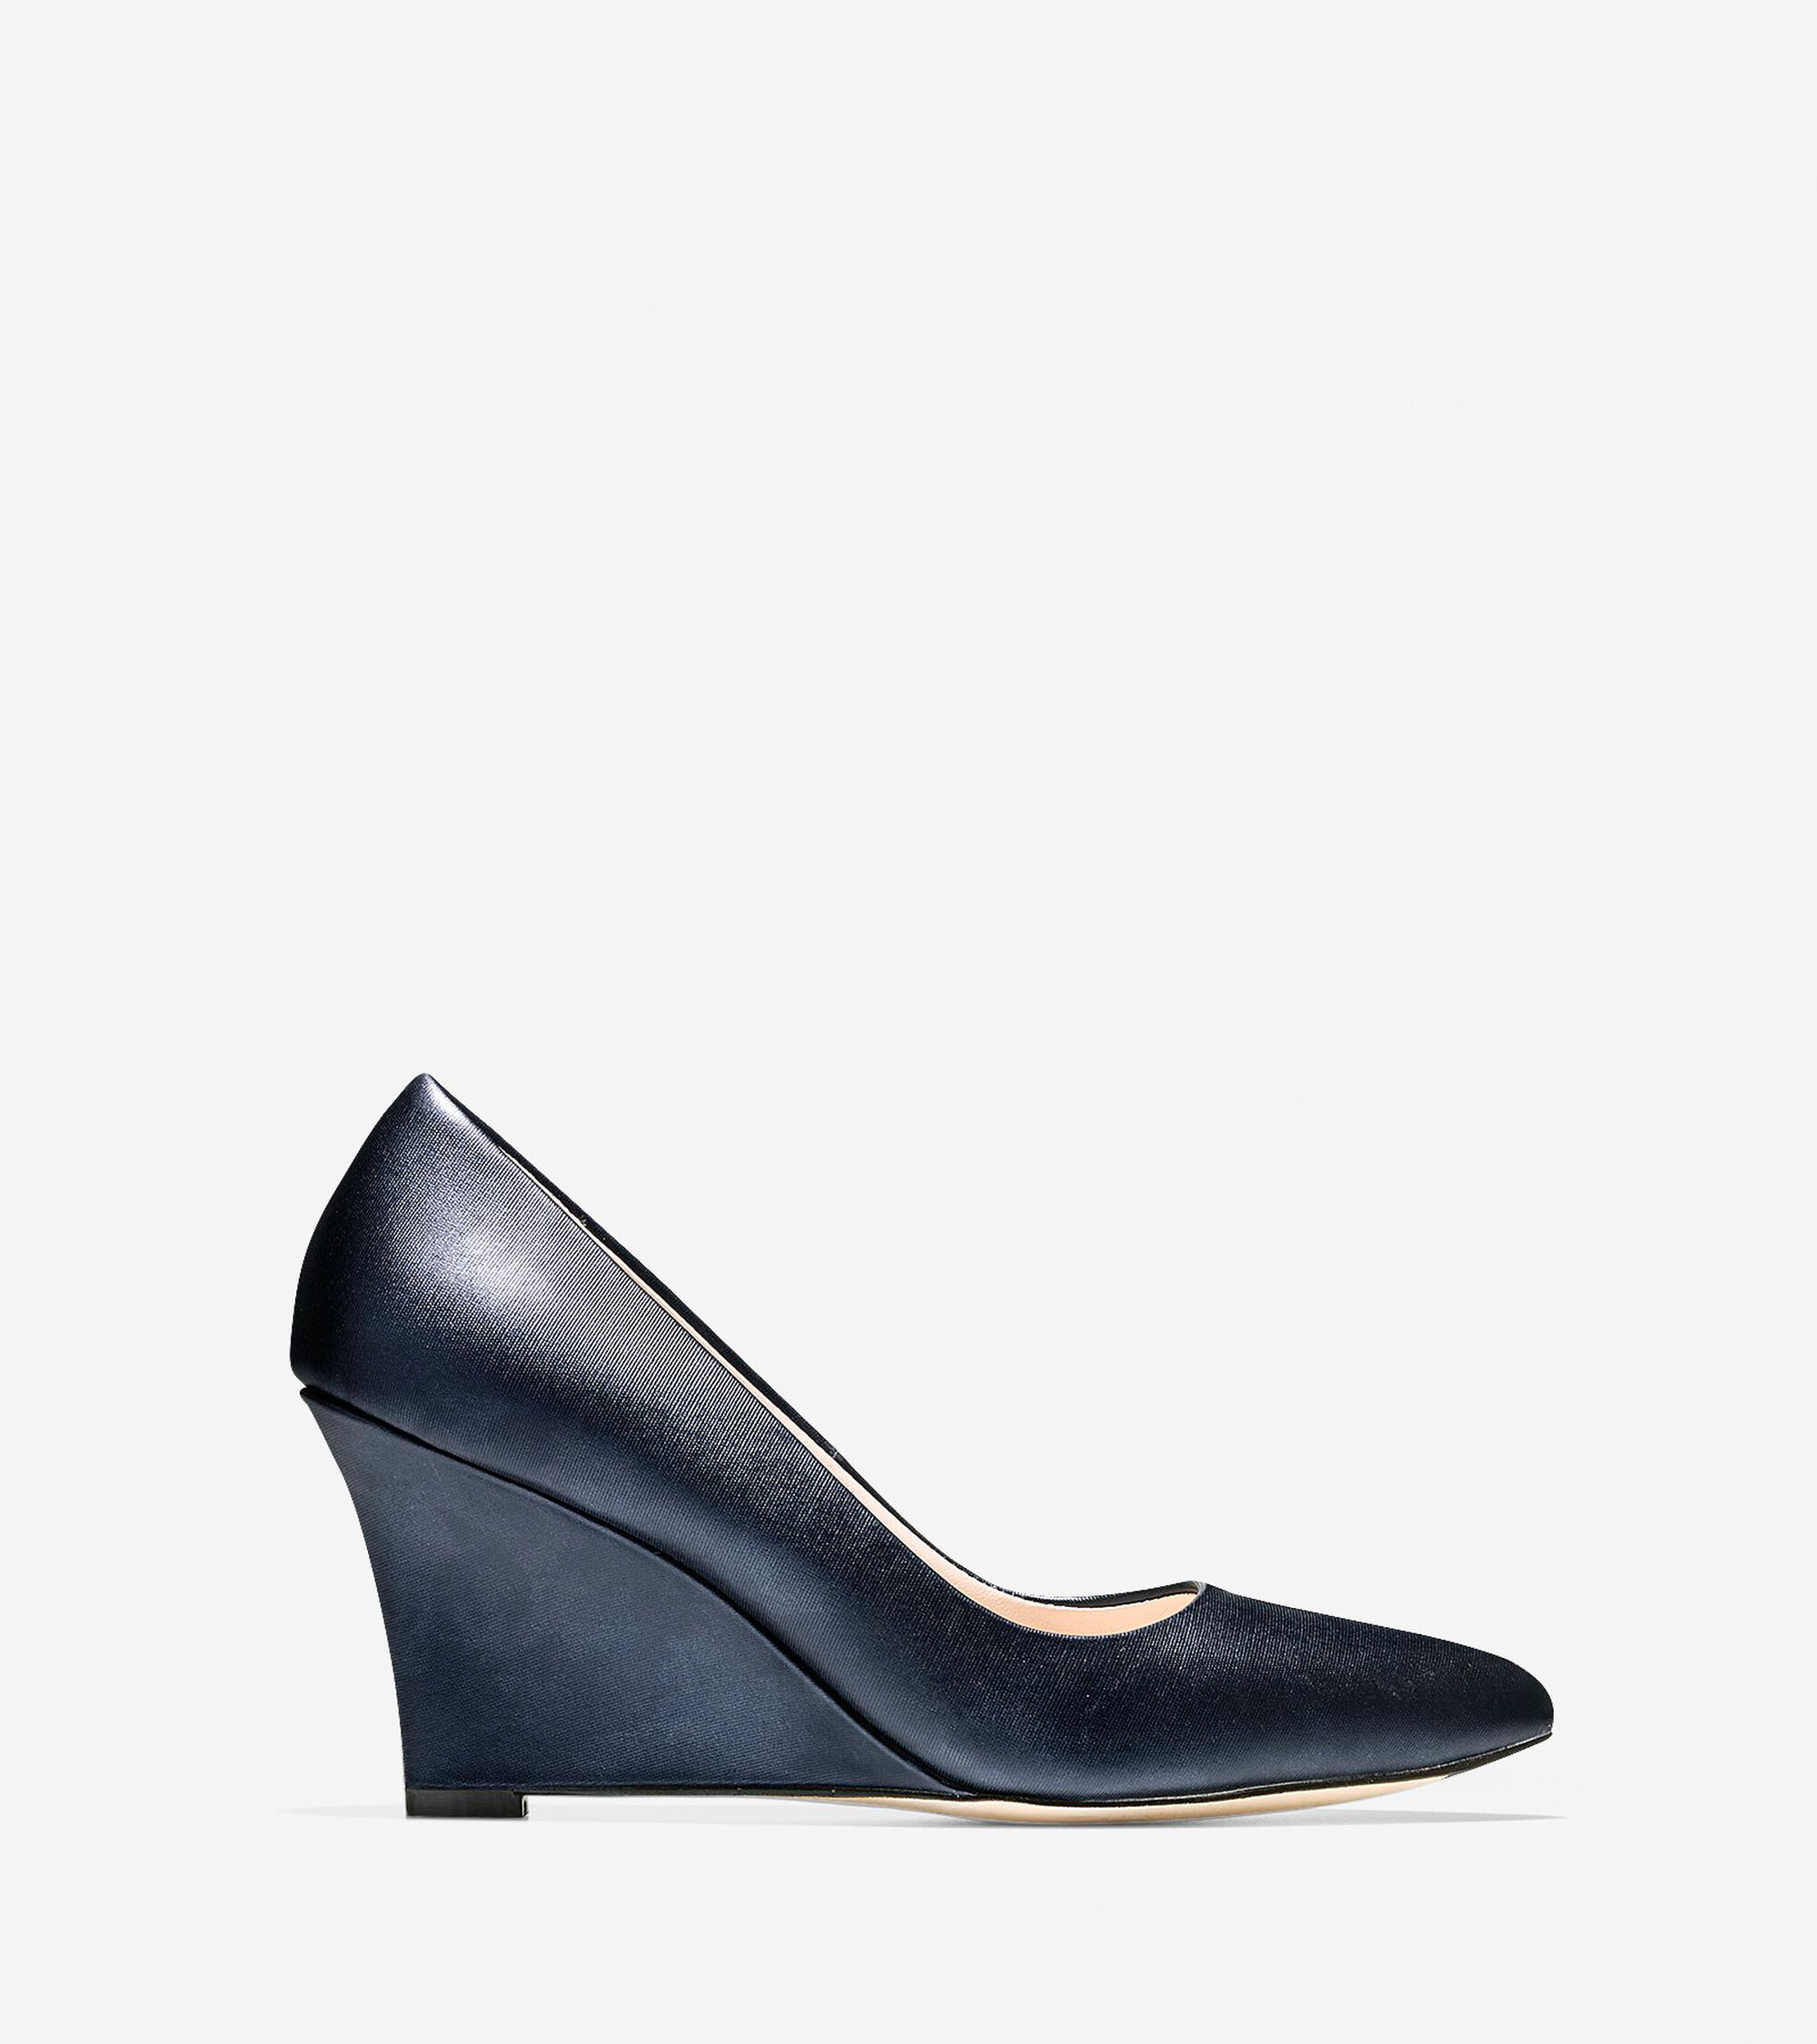 Shoes > Emery Wedge (75mm) - Almond Toe